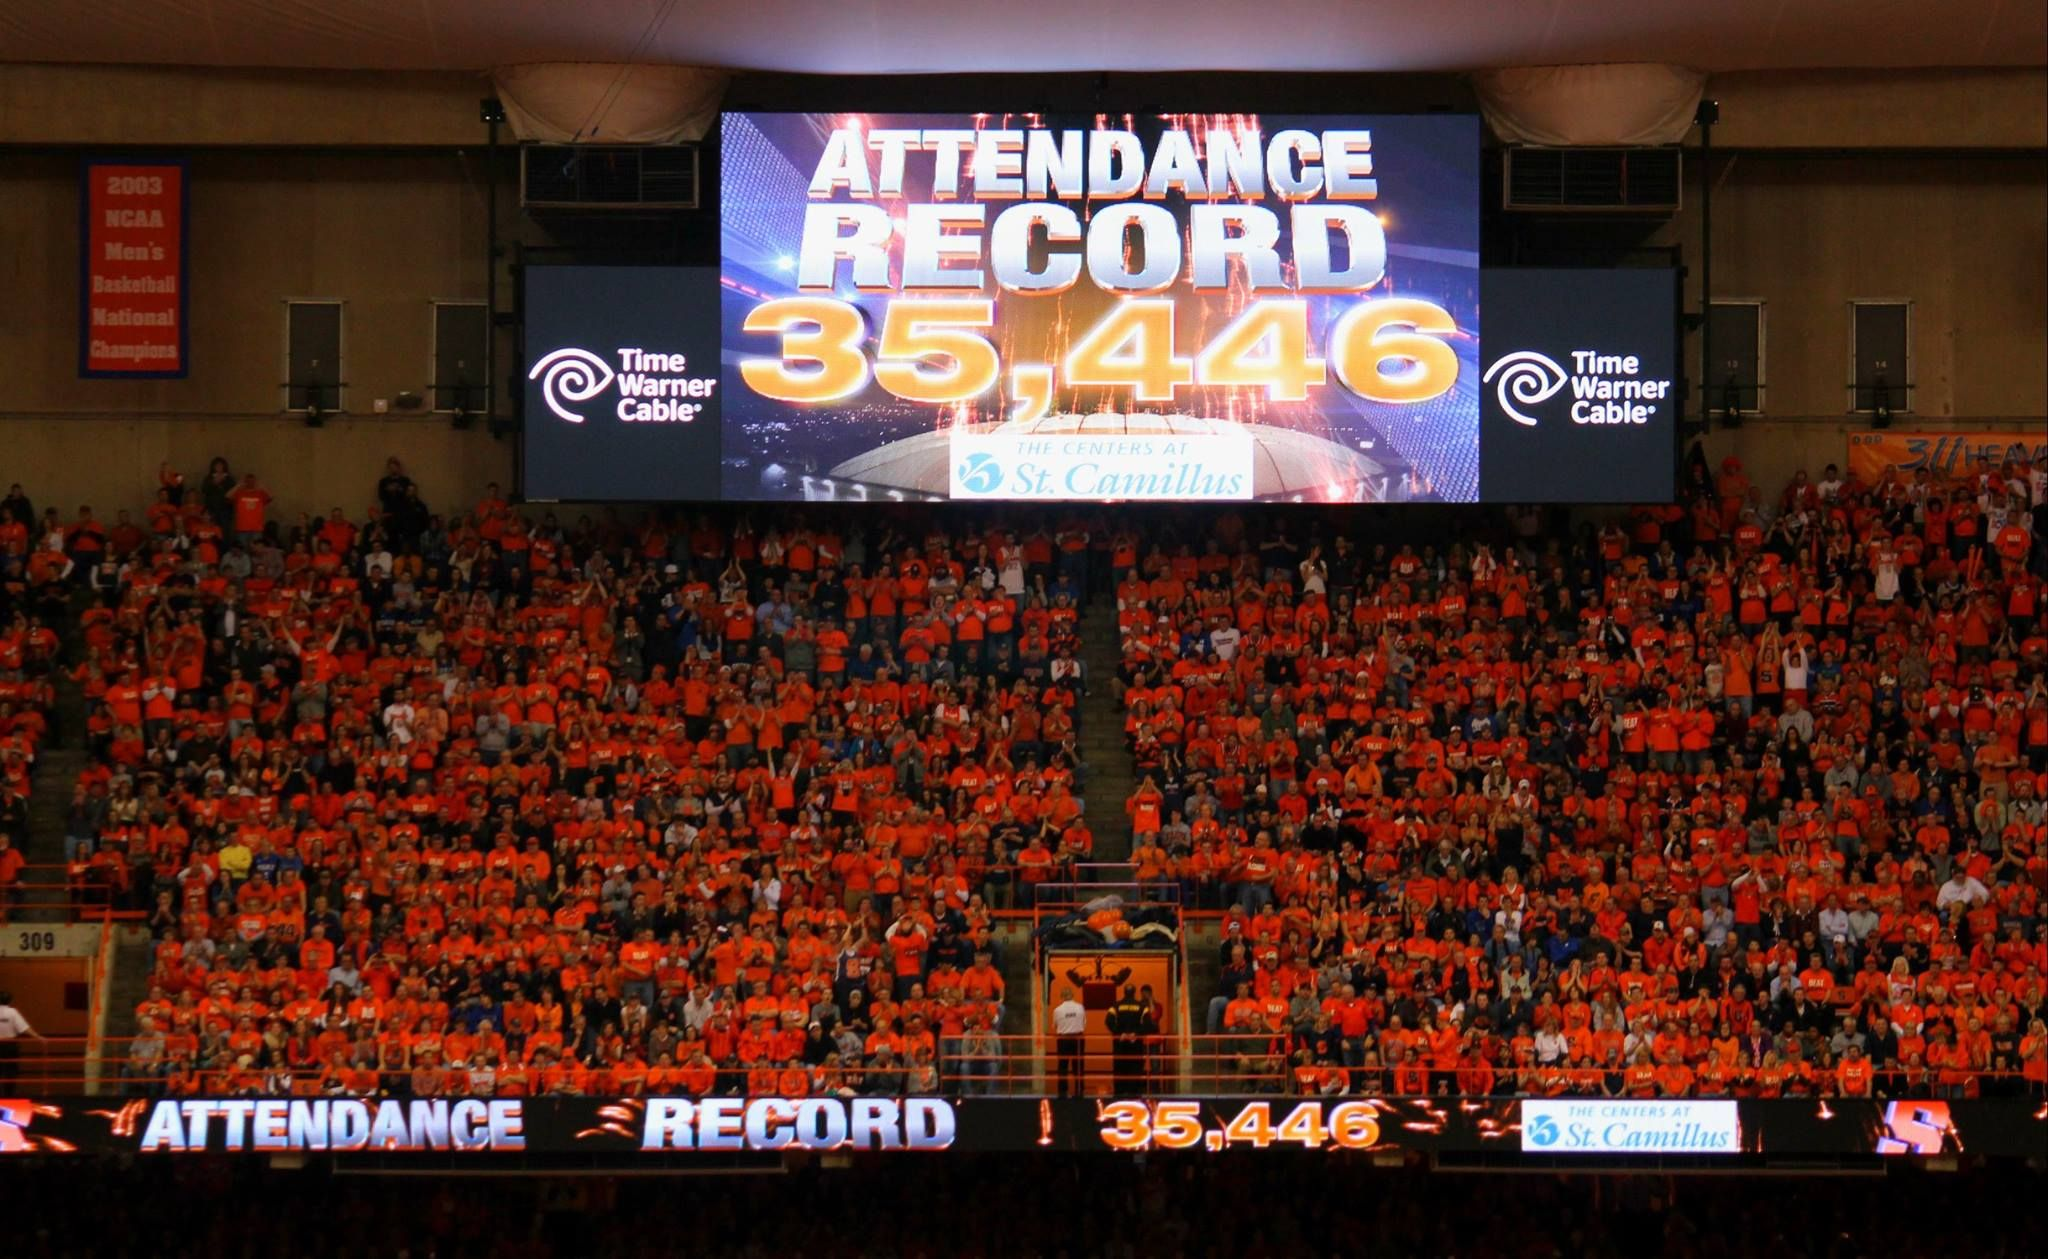 Record setting attendance at the SU/Duke game 2/1/14